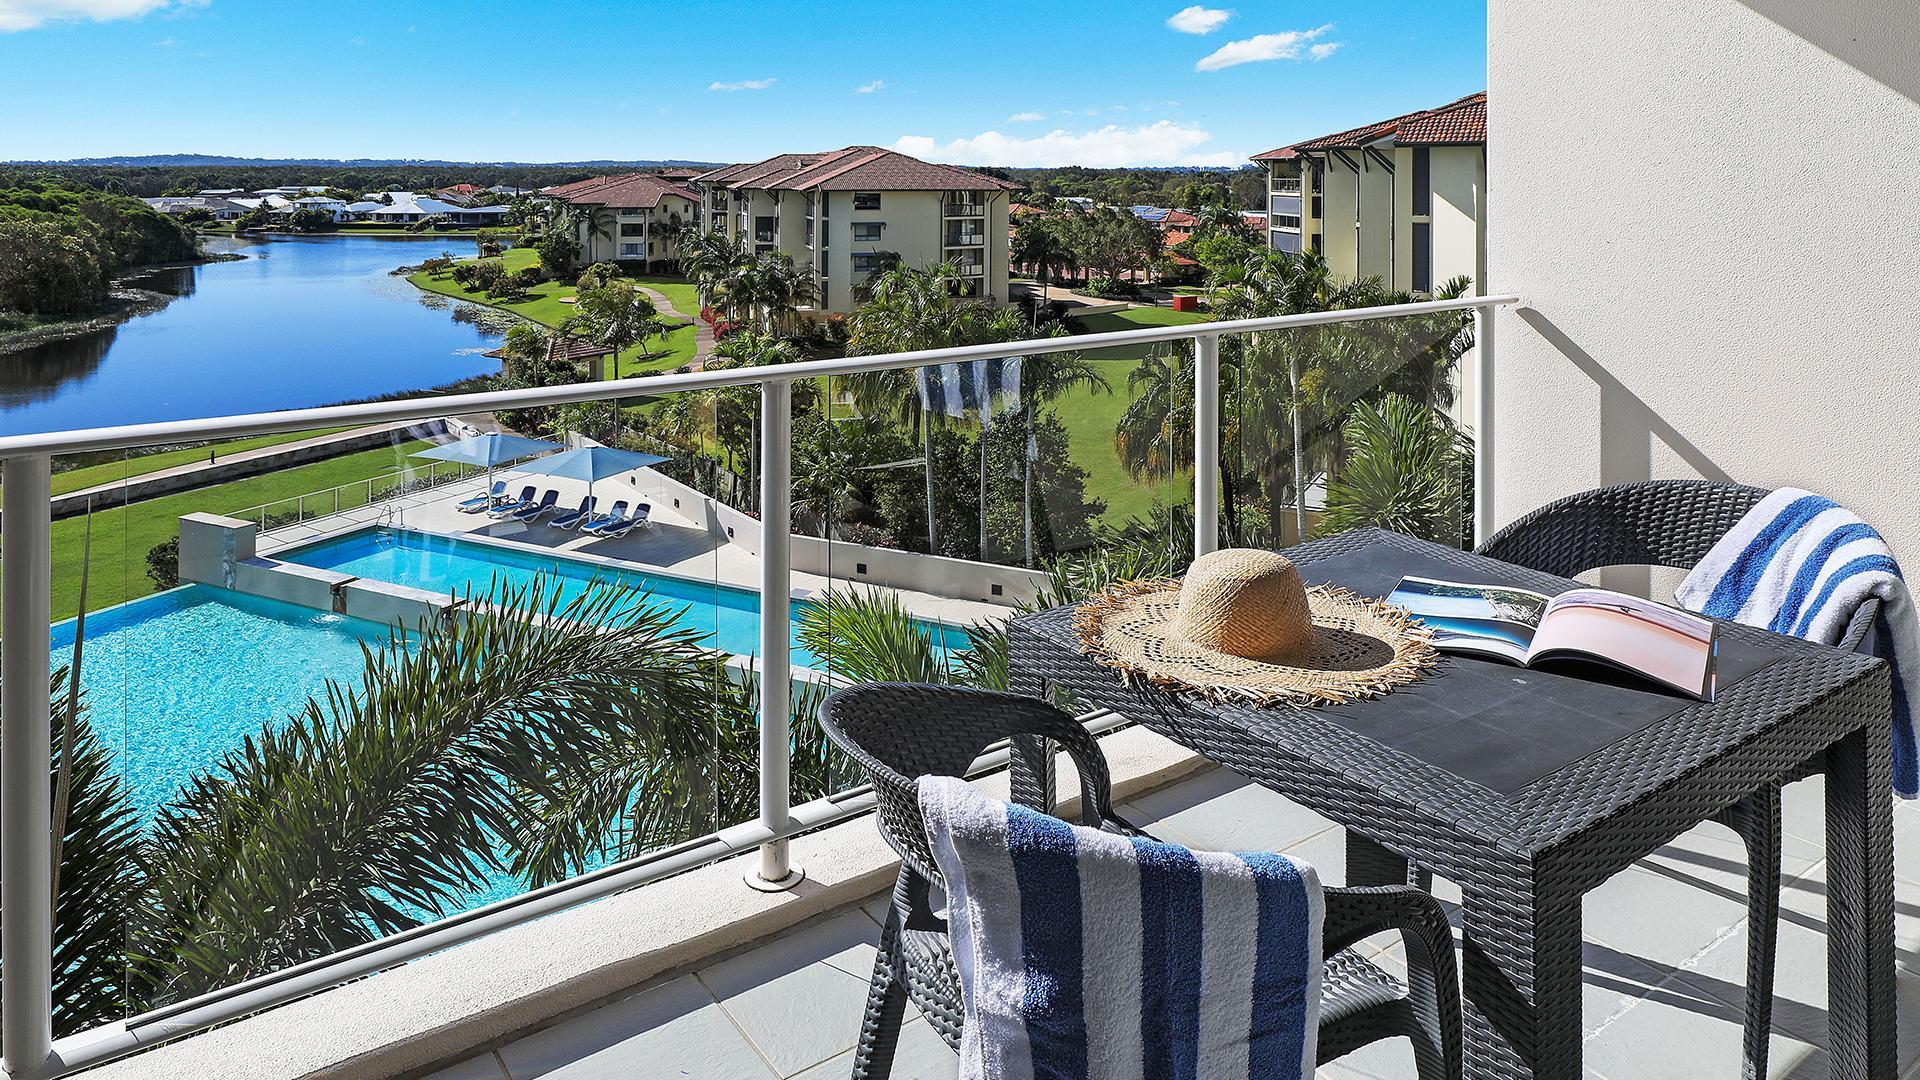 One-Bedroom Apartment image 1 at Pelican Waters Resort by Sunshine Coast Regional, Queensland, Australia